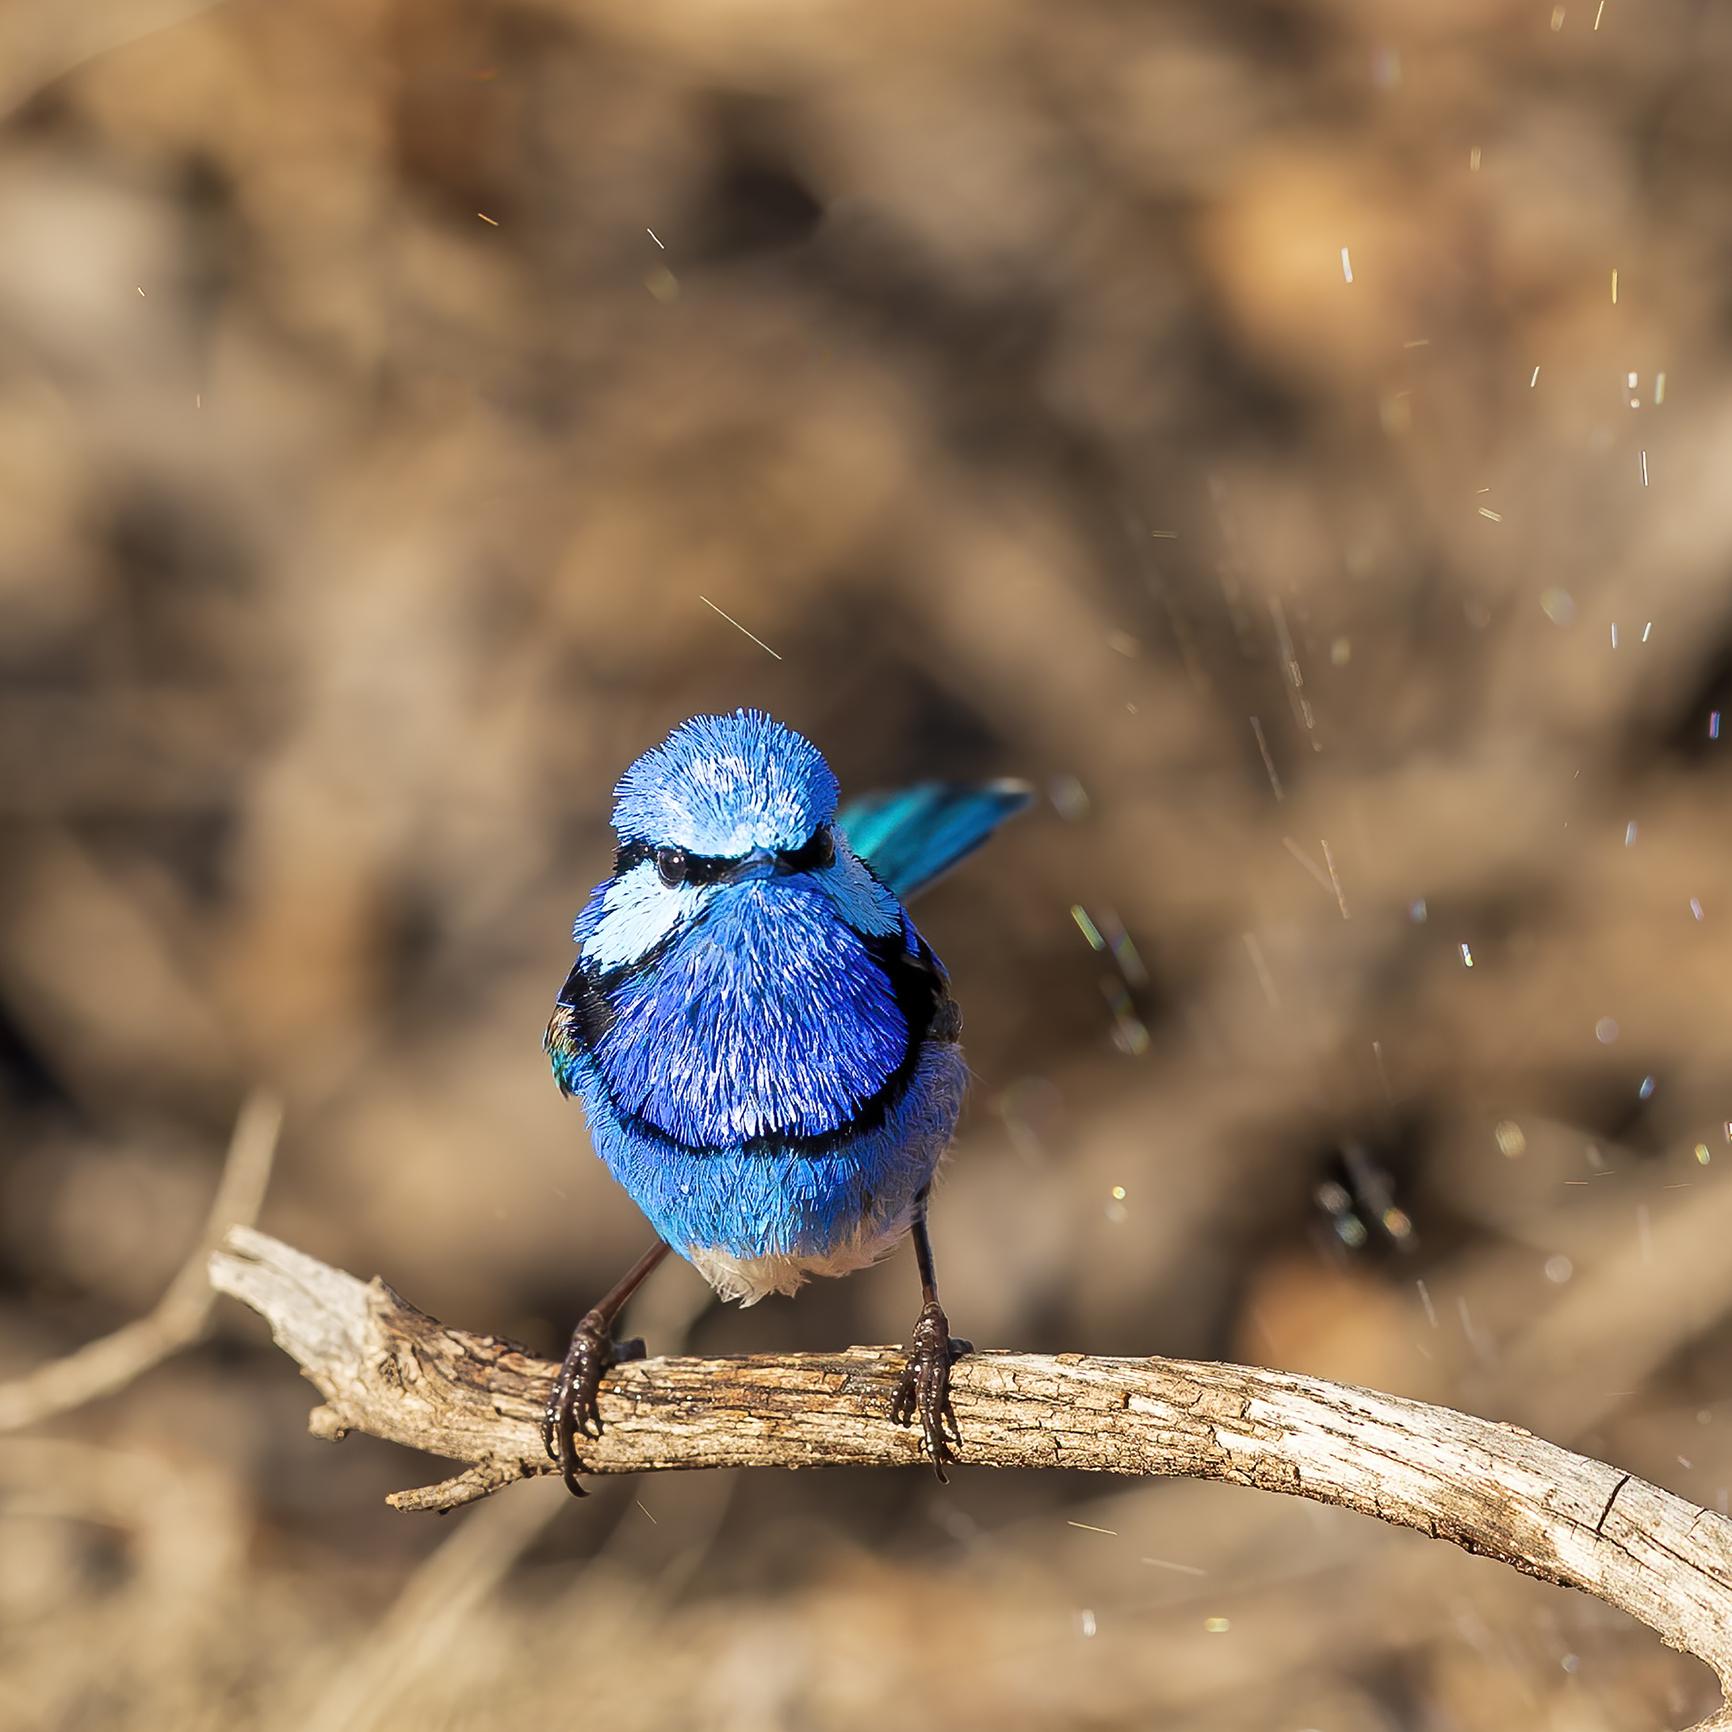 A male Splendid Fairywren with colourful breeding plumage